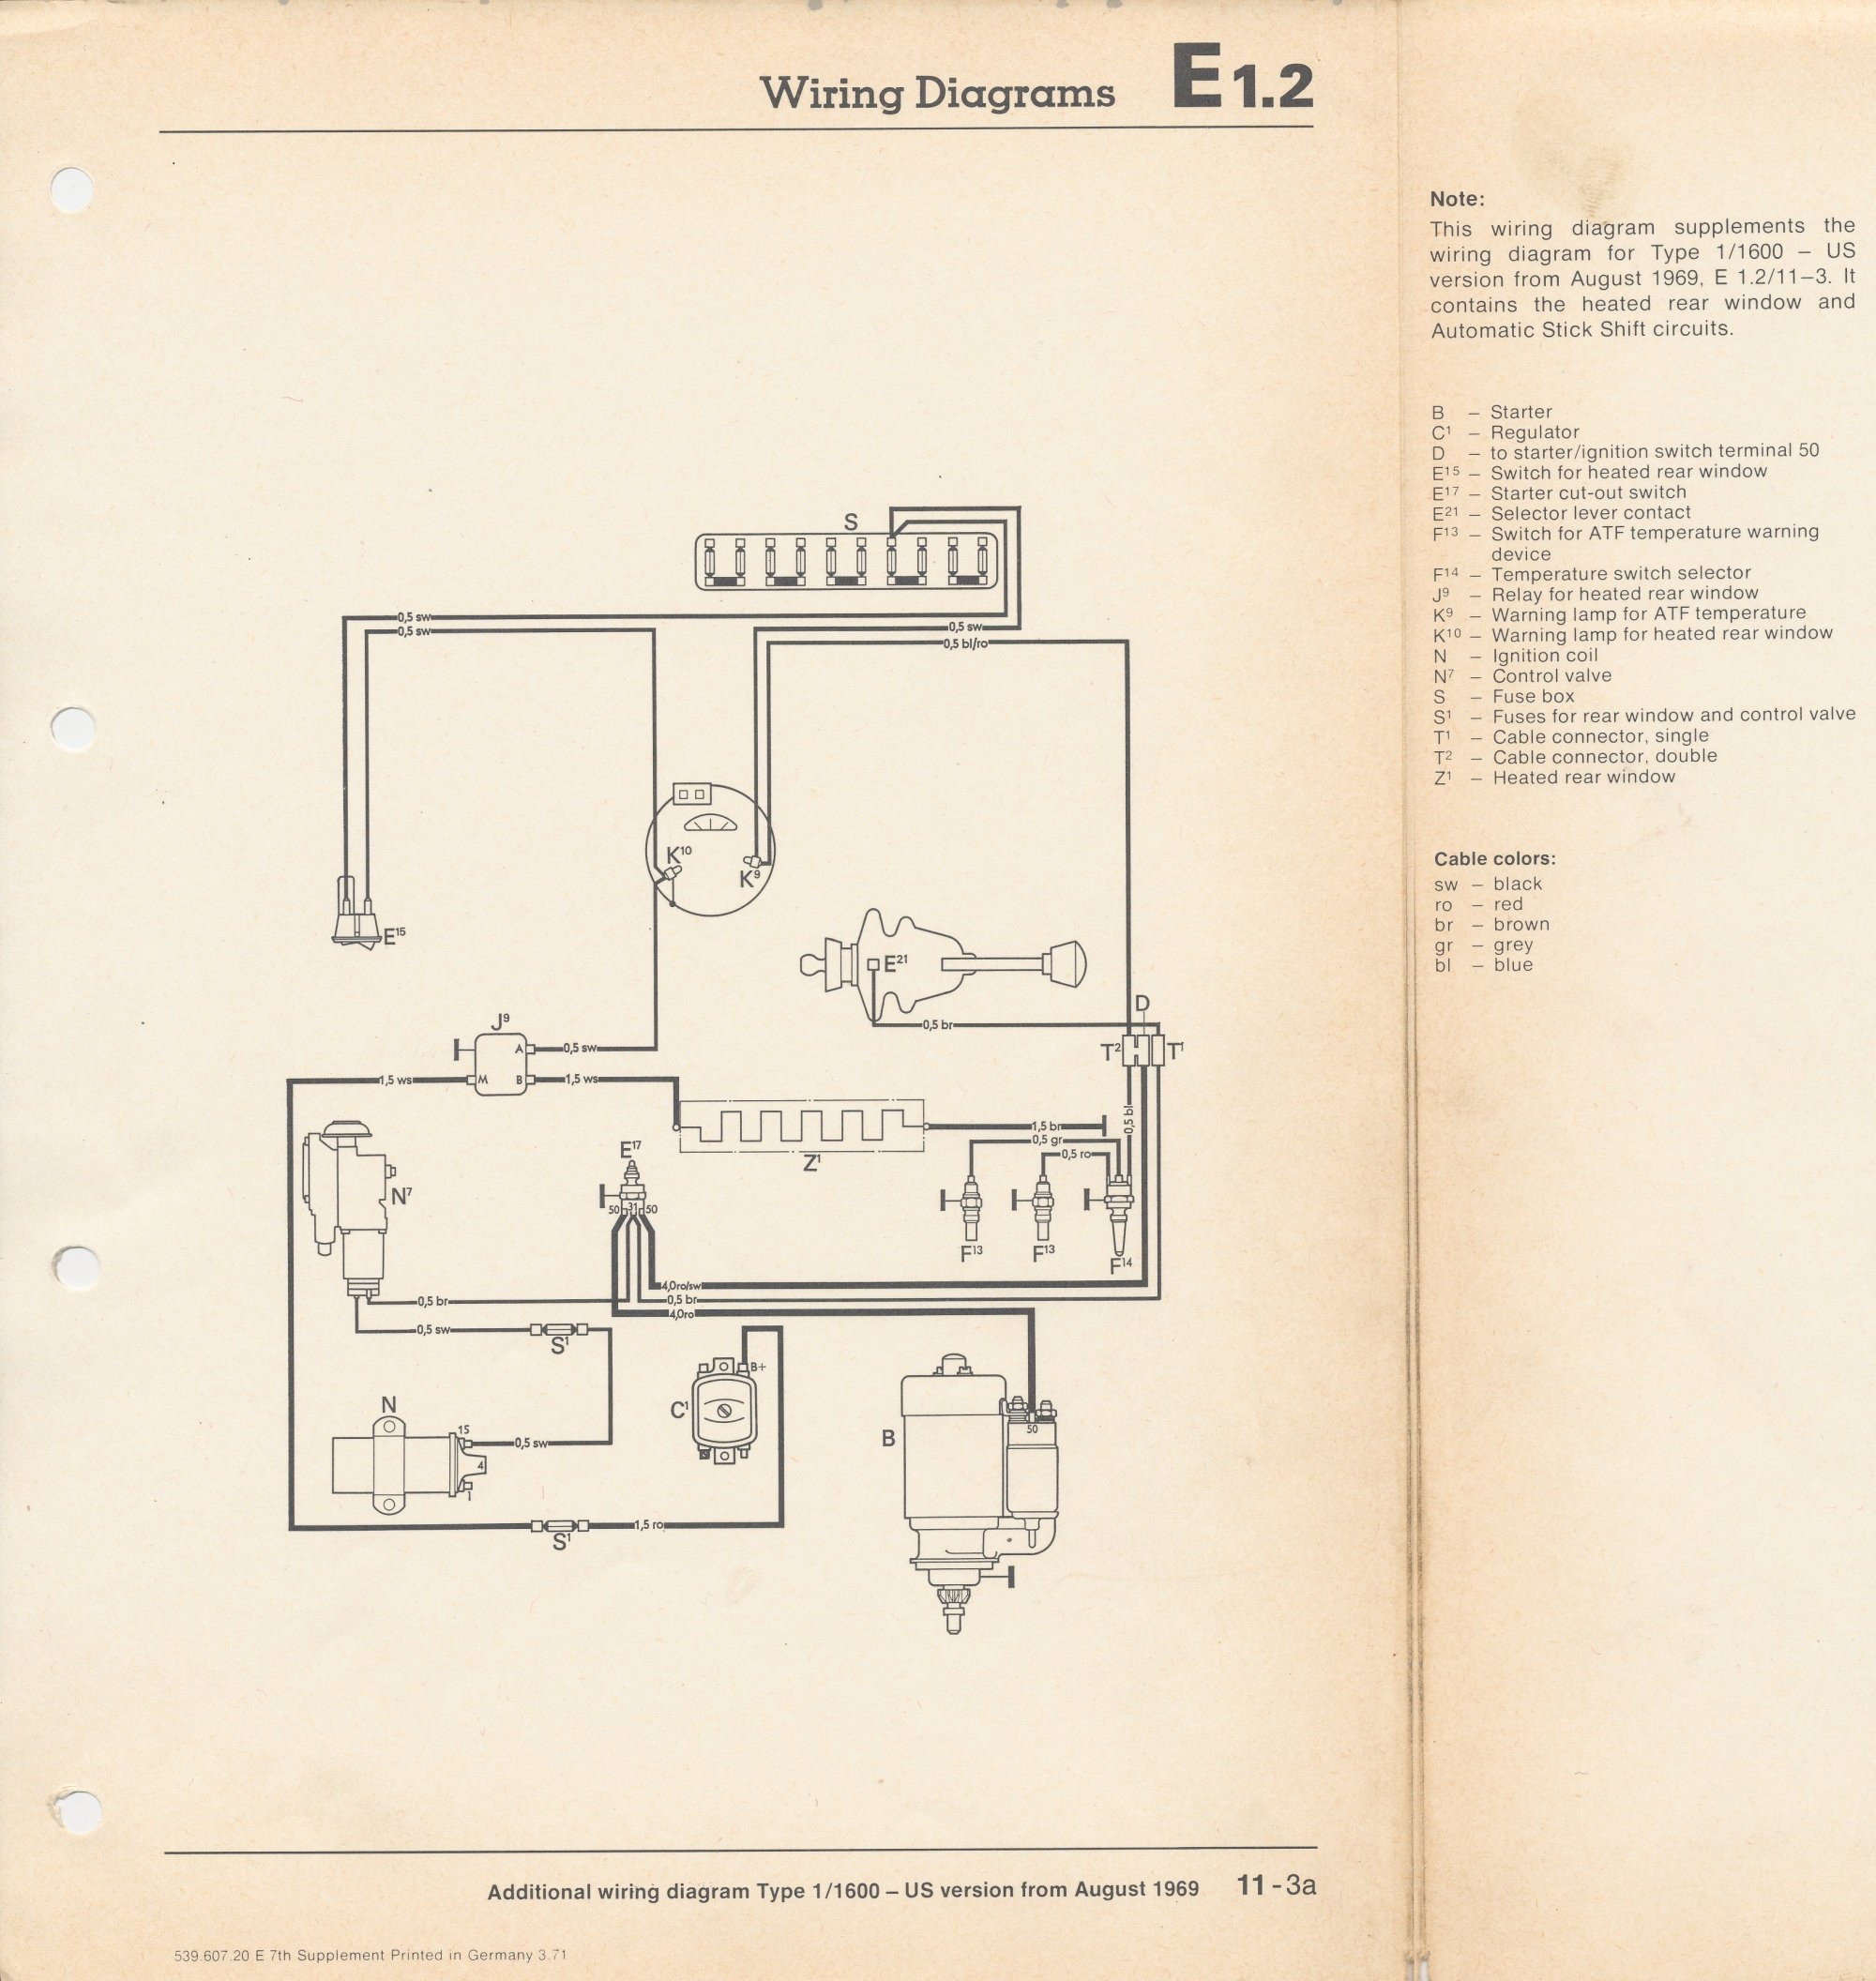 hight resolution of vw bus furthermore vw bus fuse box diagram furthermore 1970 vw bus karmann ghia turn signal